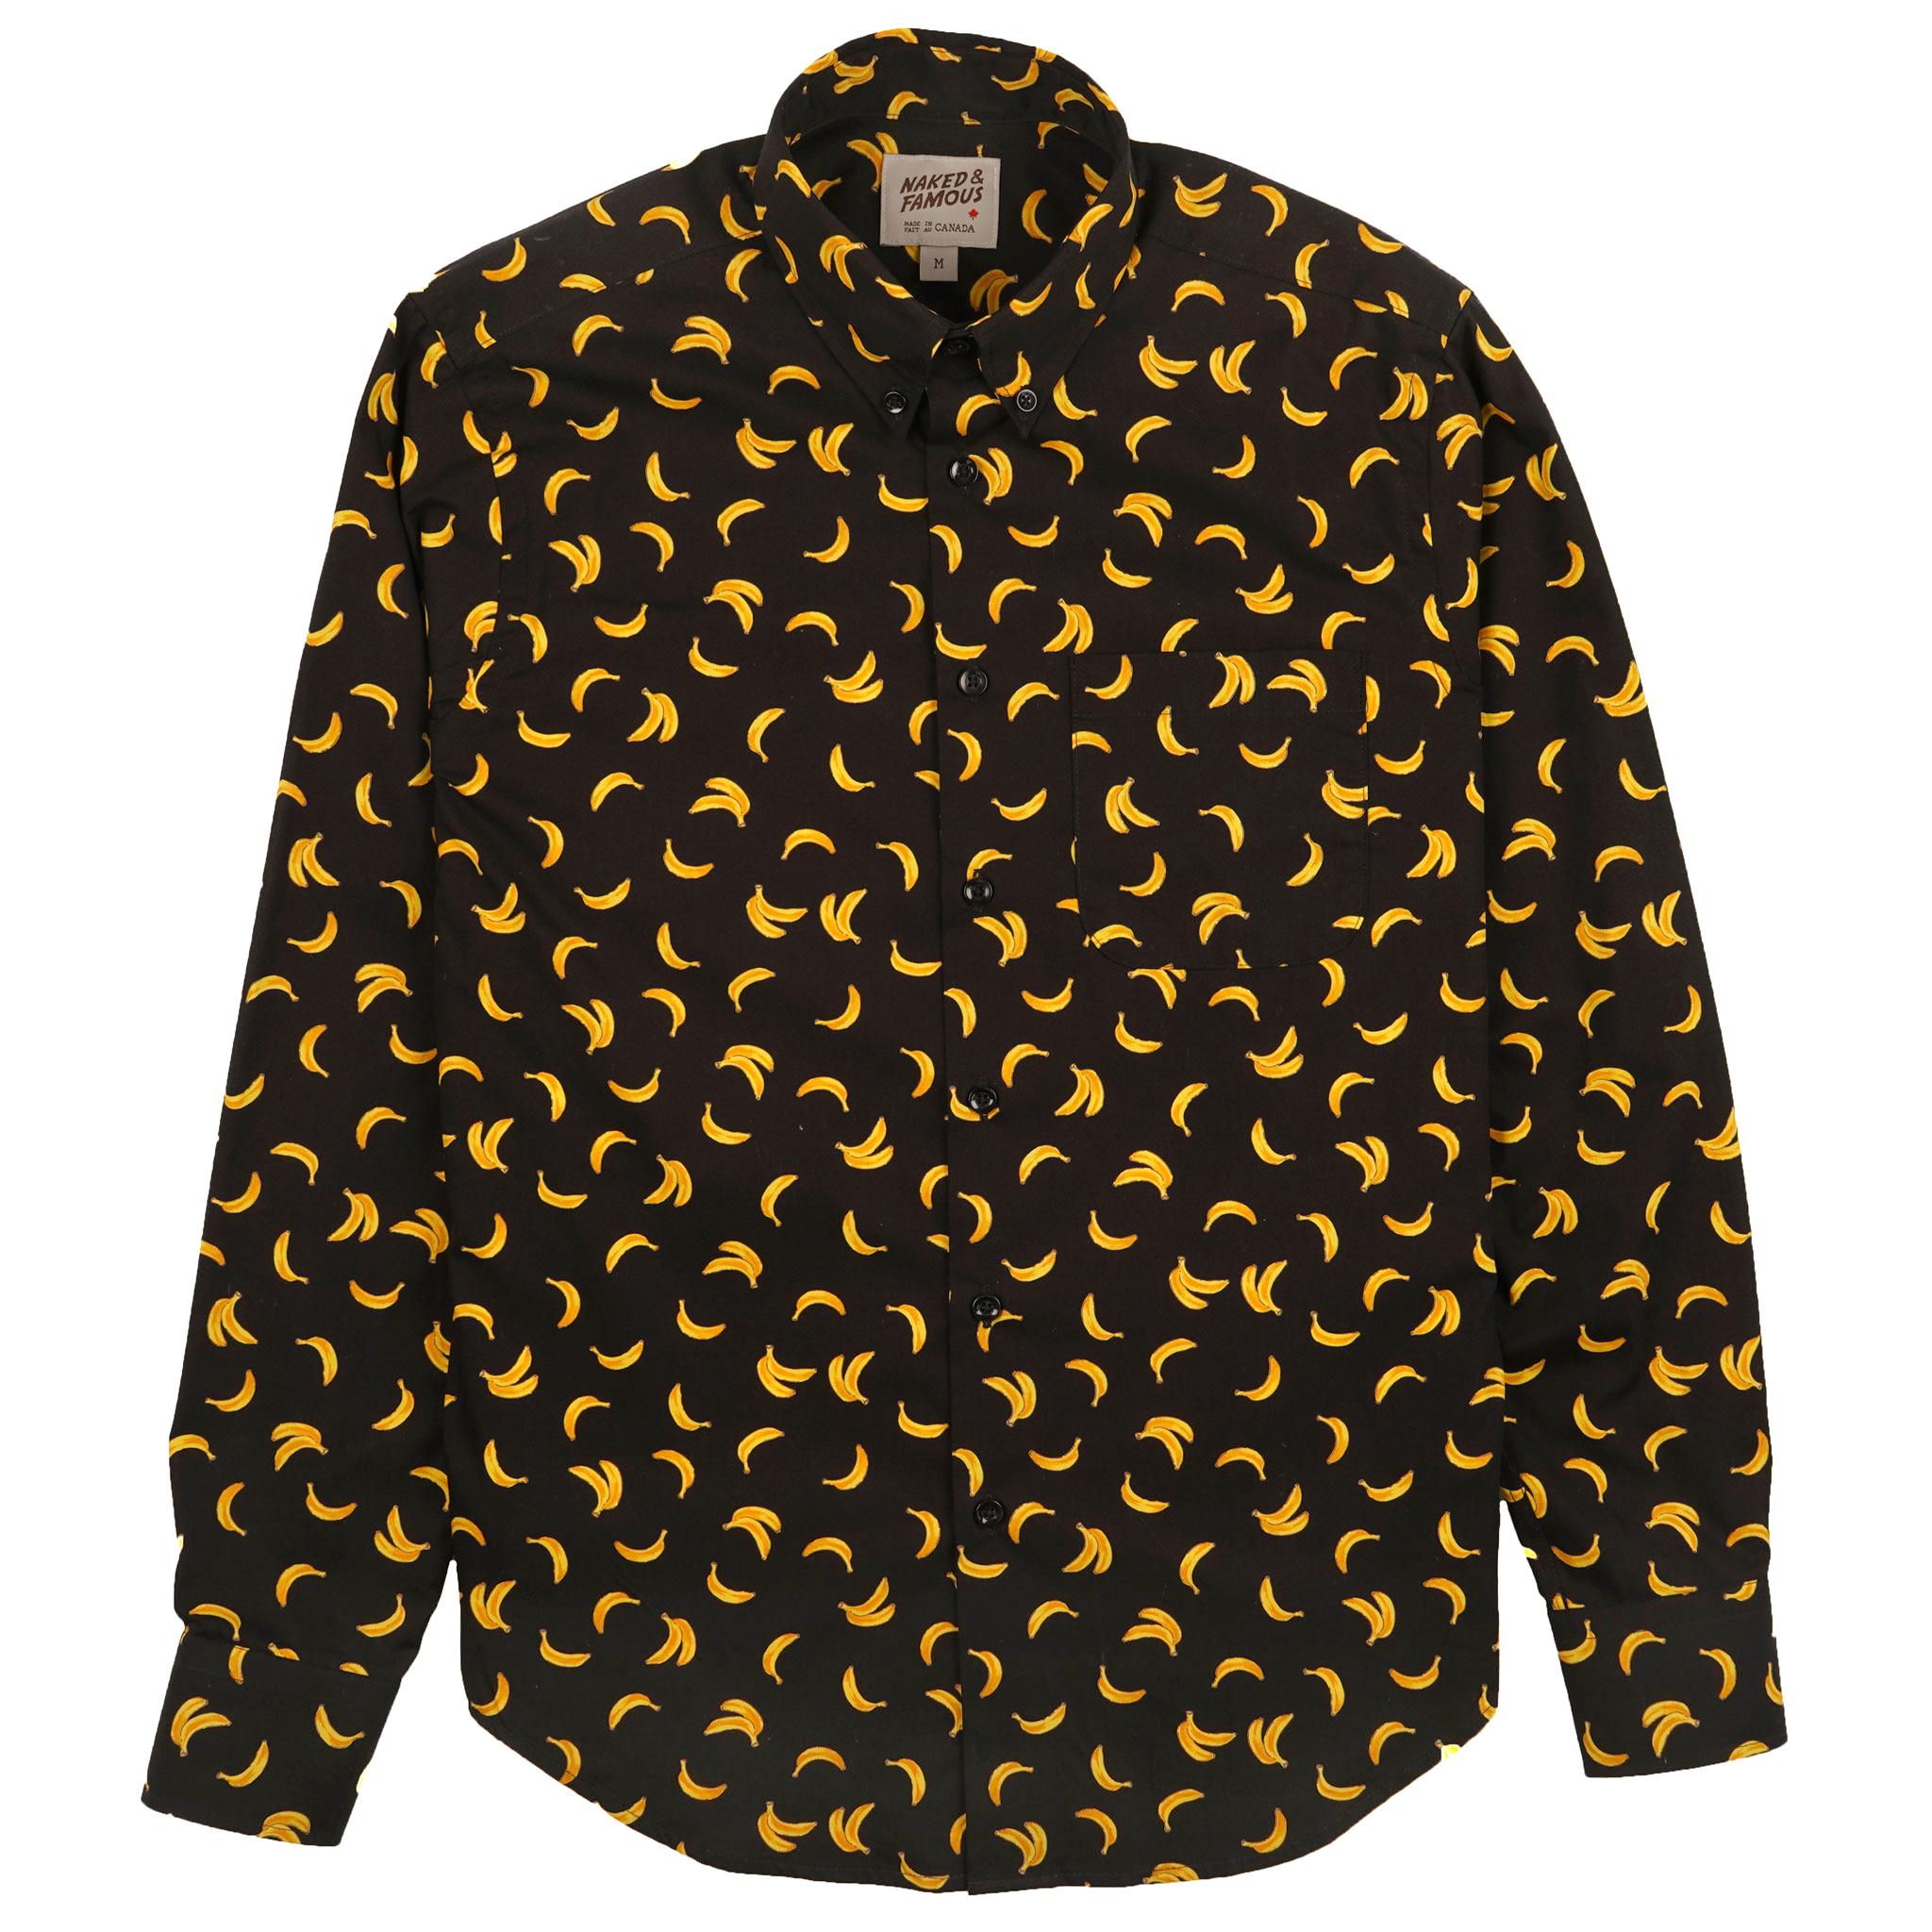 Banana Print - Black - Easy Shirt